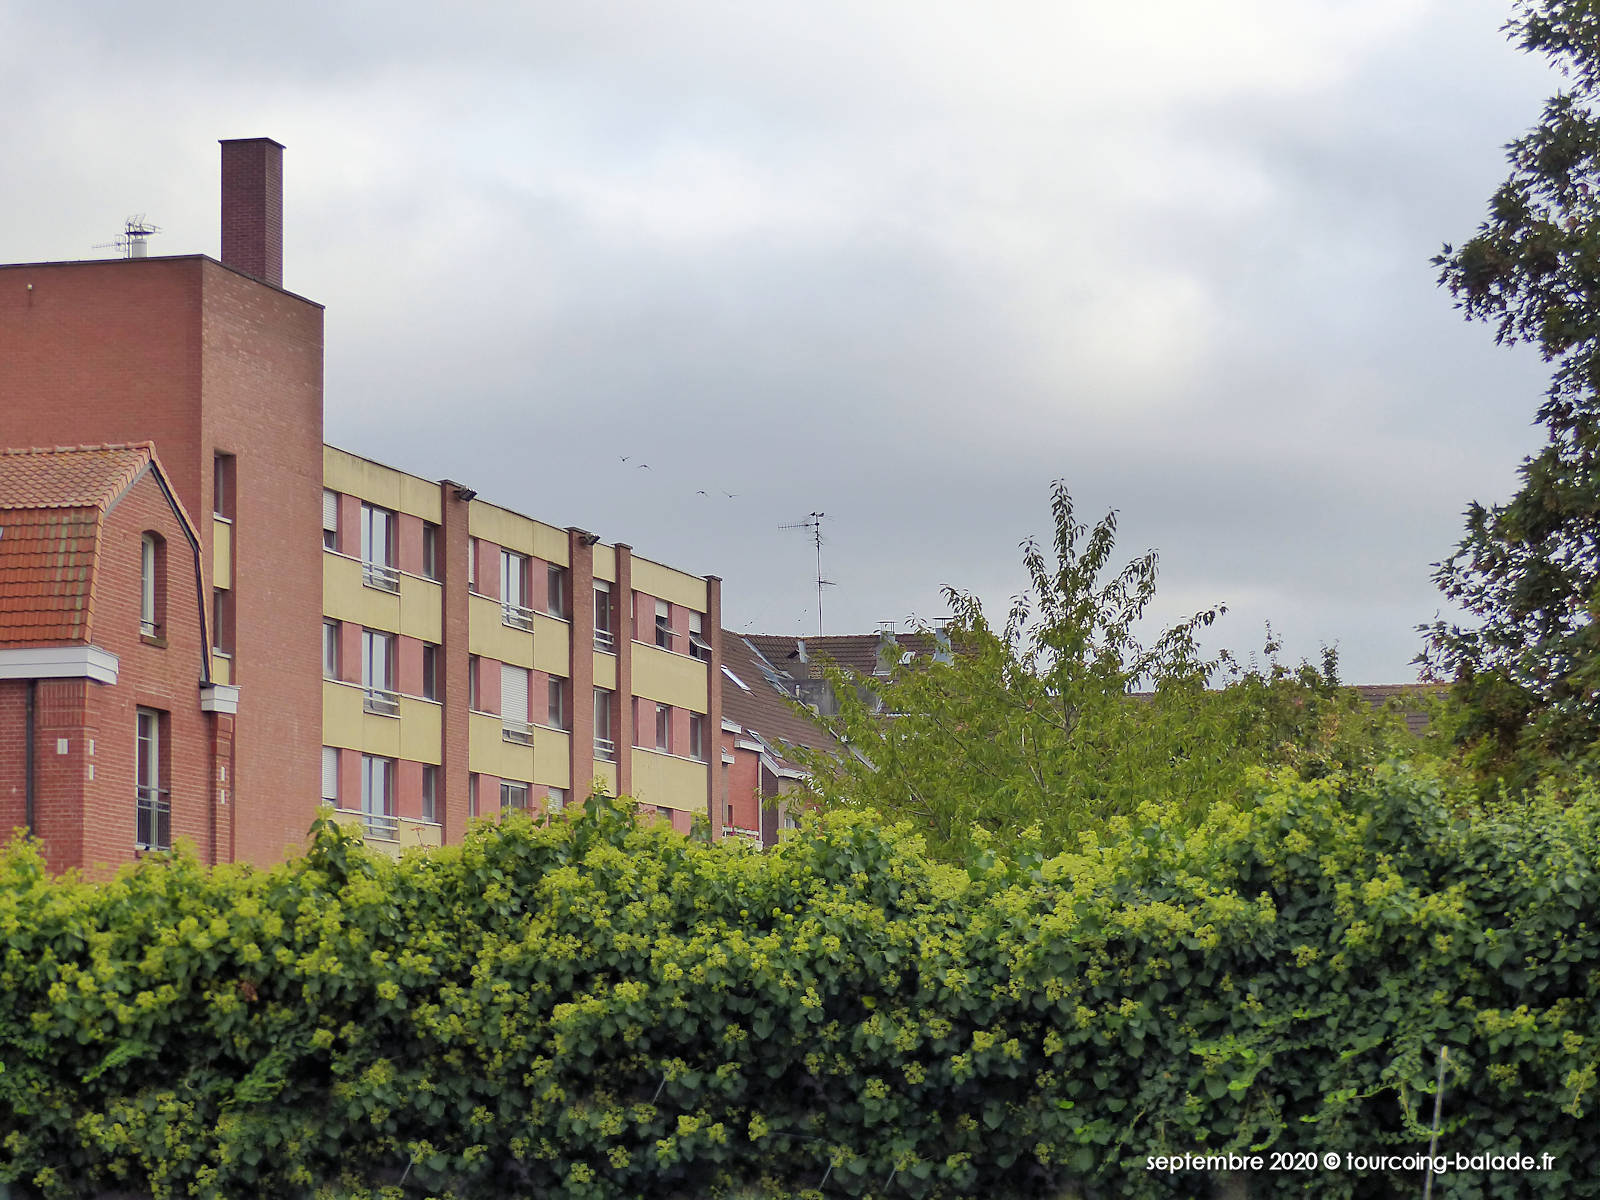 Tourcoing Habitats - Résidence Turenne, 2020